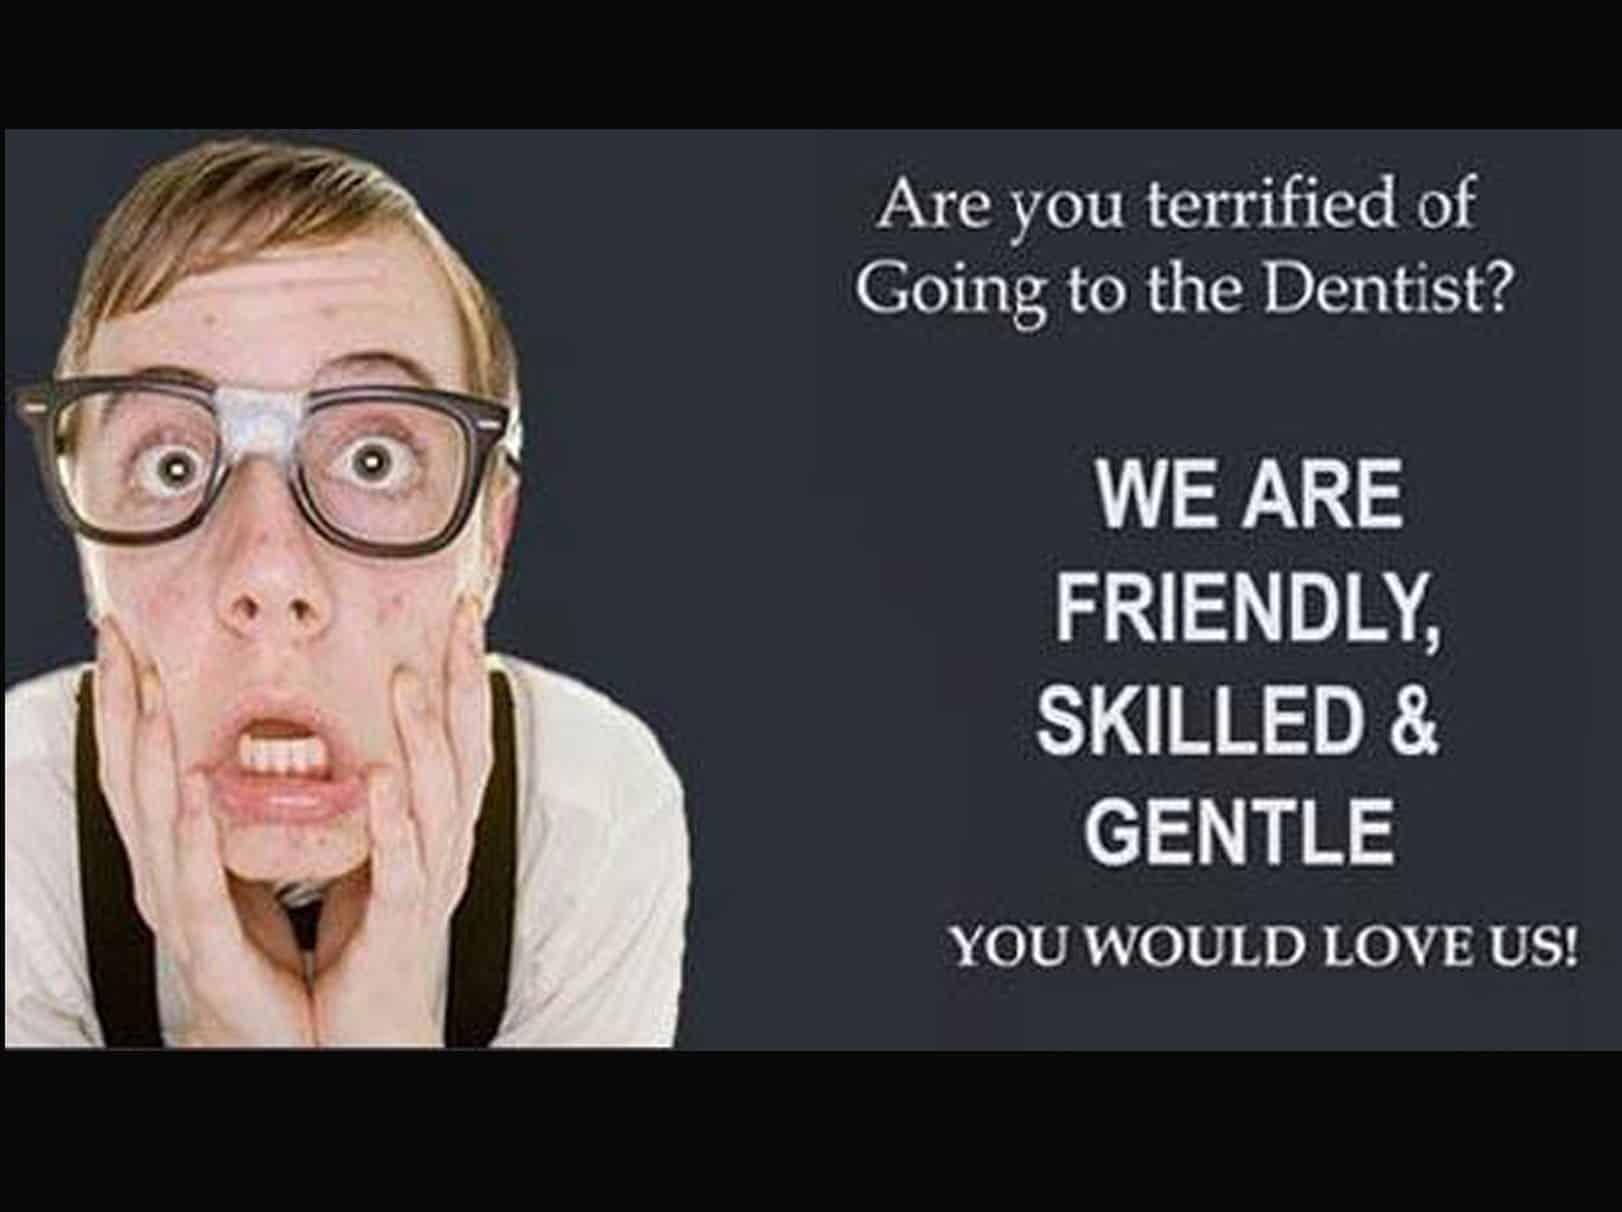 Gentle Dentist in Melbourne | Best Phobic-friendly Dentist | Gentle Dental - Dental Anxiety, Fear, & Phobia Expert